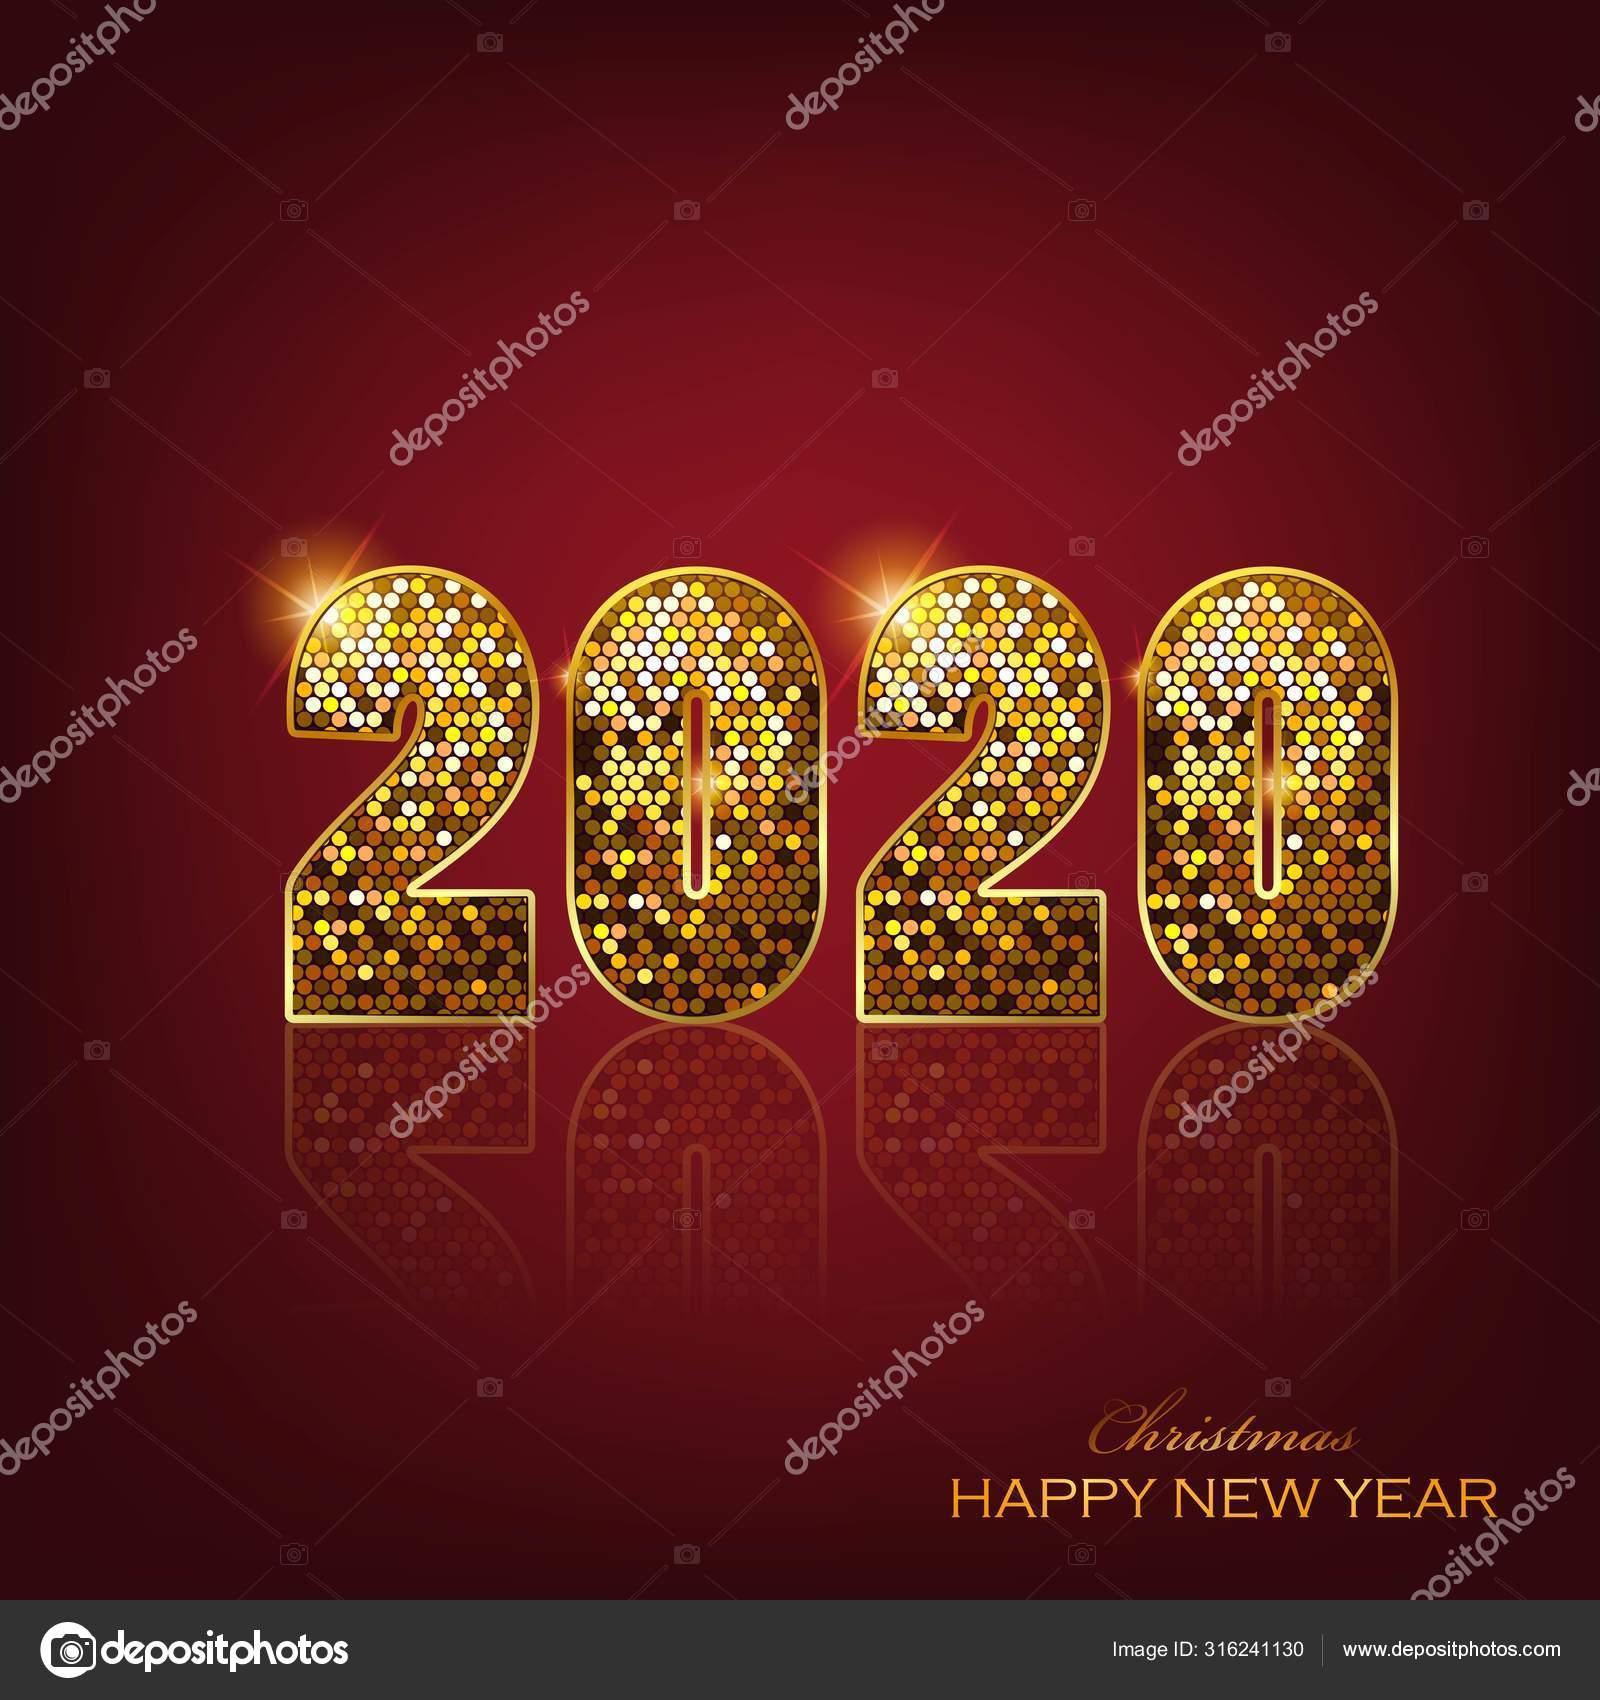 Merry Christmas Happy New Year 2020 Greeting Card Illustration Elegant Stok Vektor C Ashraf171 316241130